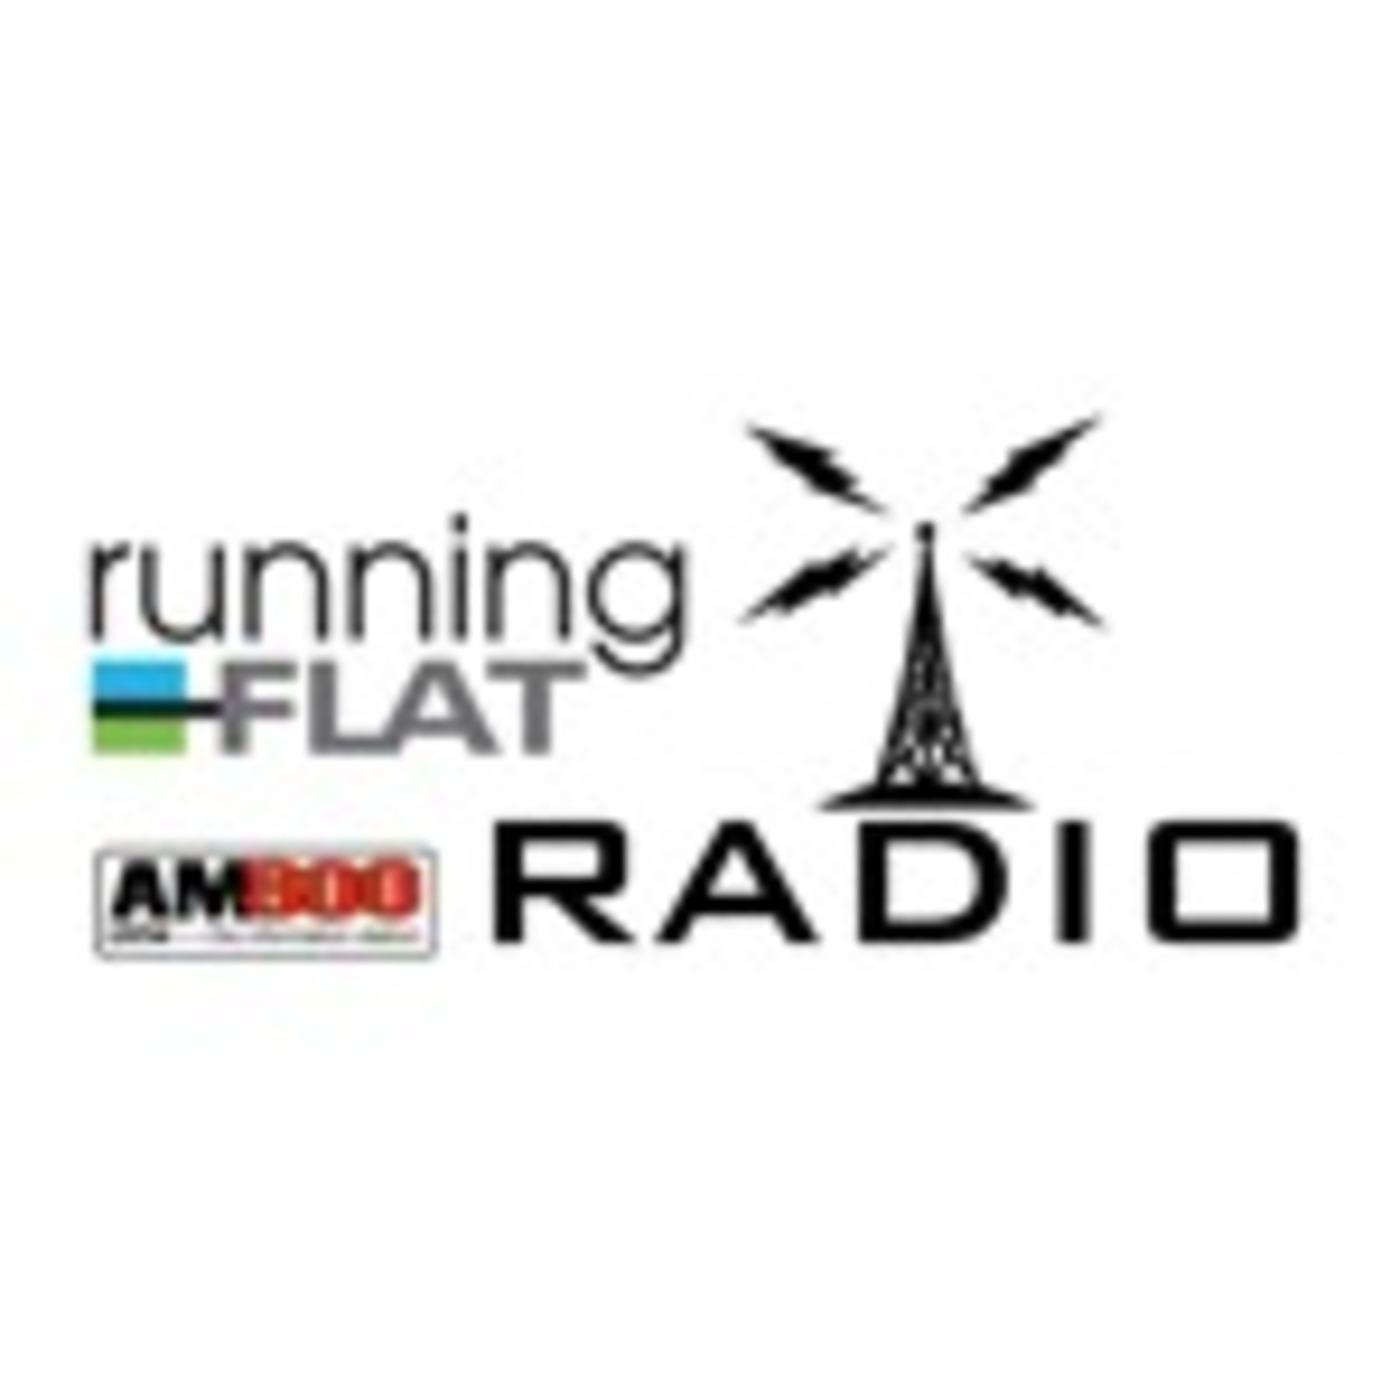 RunningFlat Radio Podcast